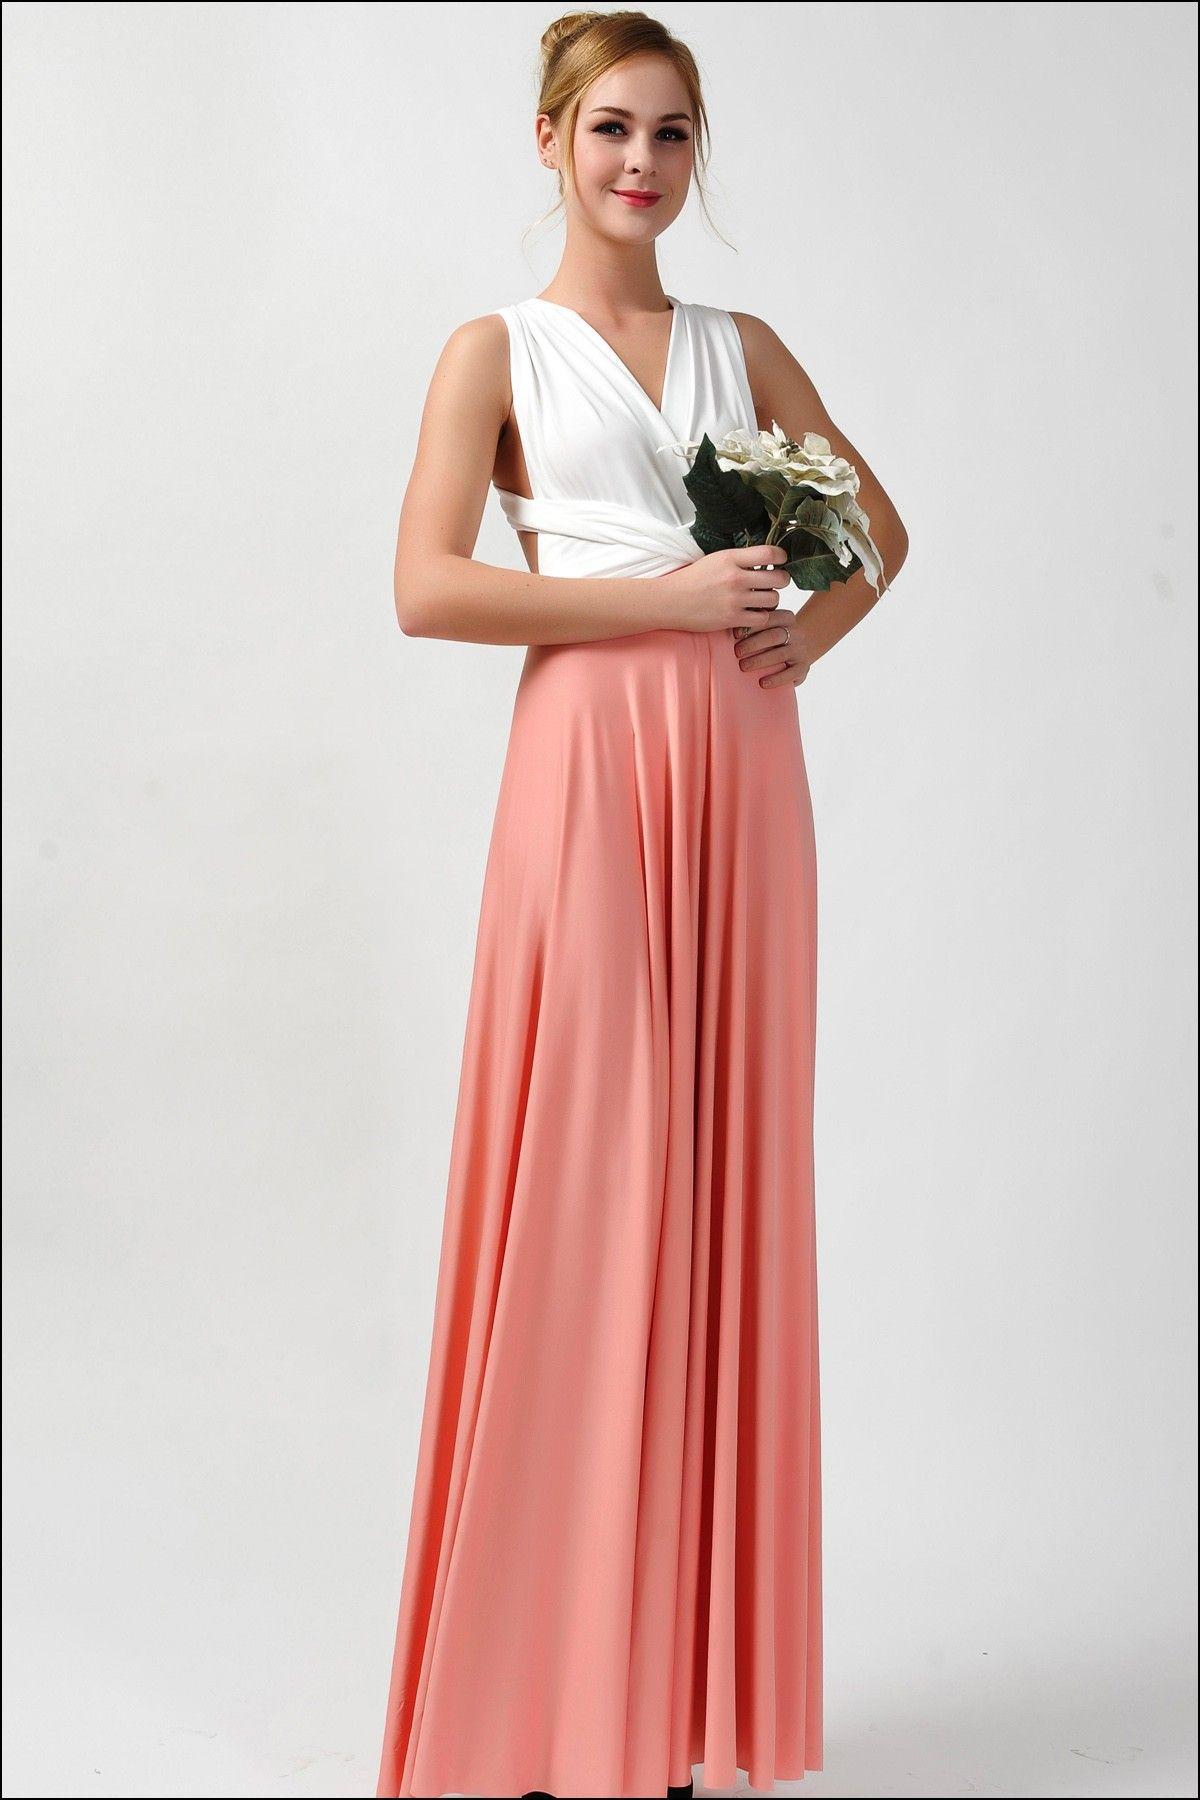 Elegant maxi dresses for weddings  Coral Maxi Dresses Bridesmaid  Dresses and Gowns Ideas  Pinterest